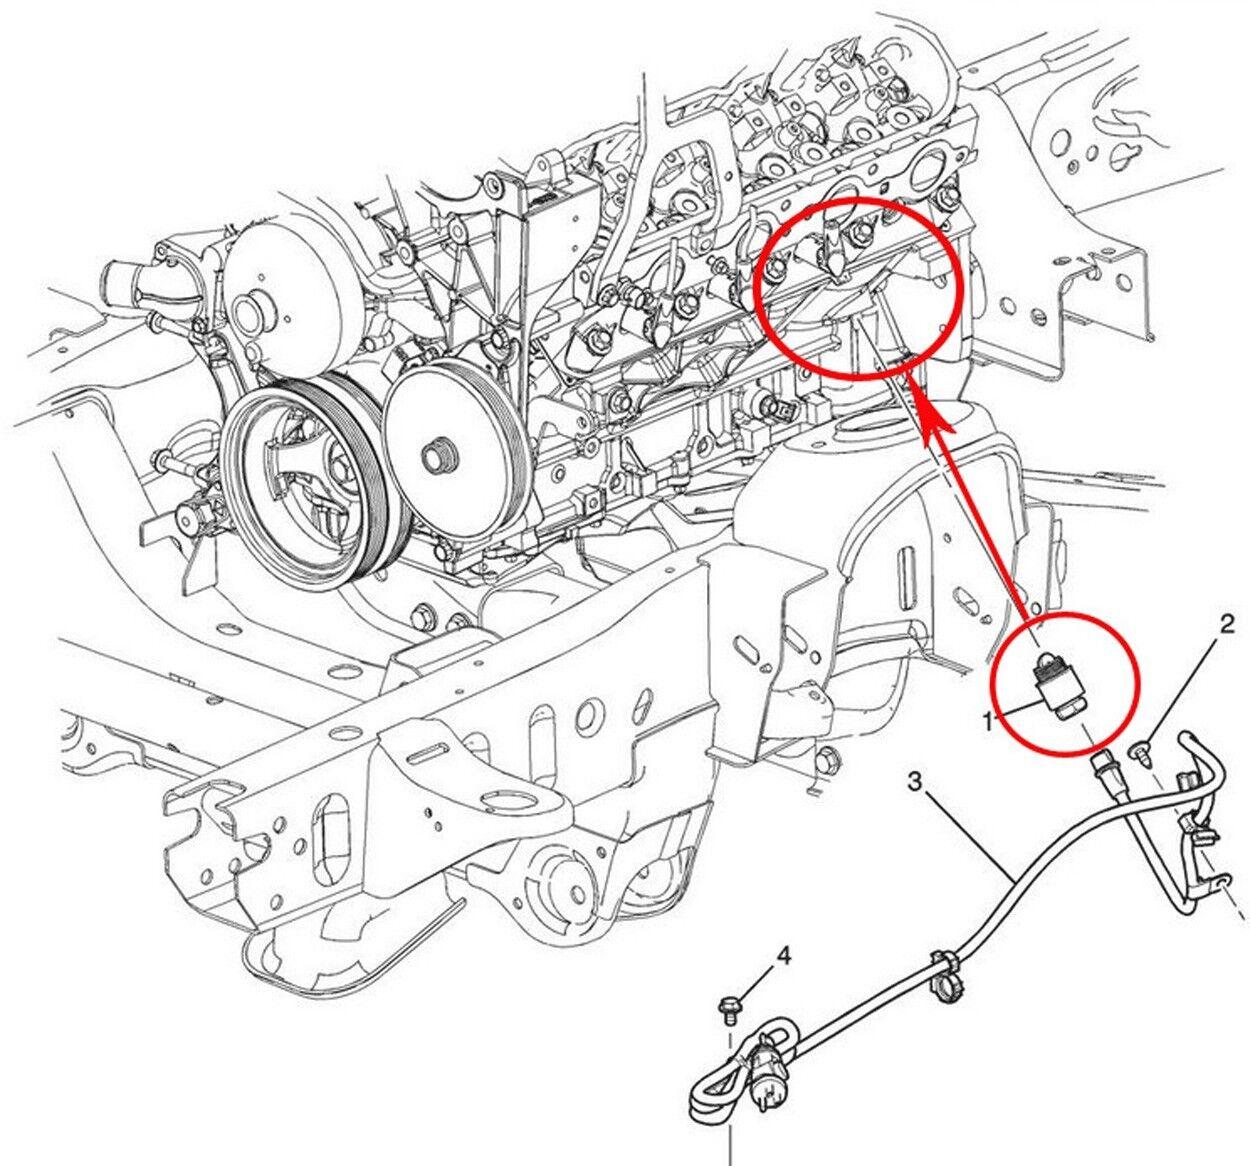 Gm 20882795 Block Heater Cord Genuine Oem Ebay Avalanche Engine Diagram Norton Secured Powered By Verisign